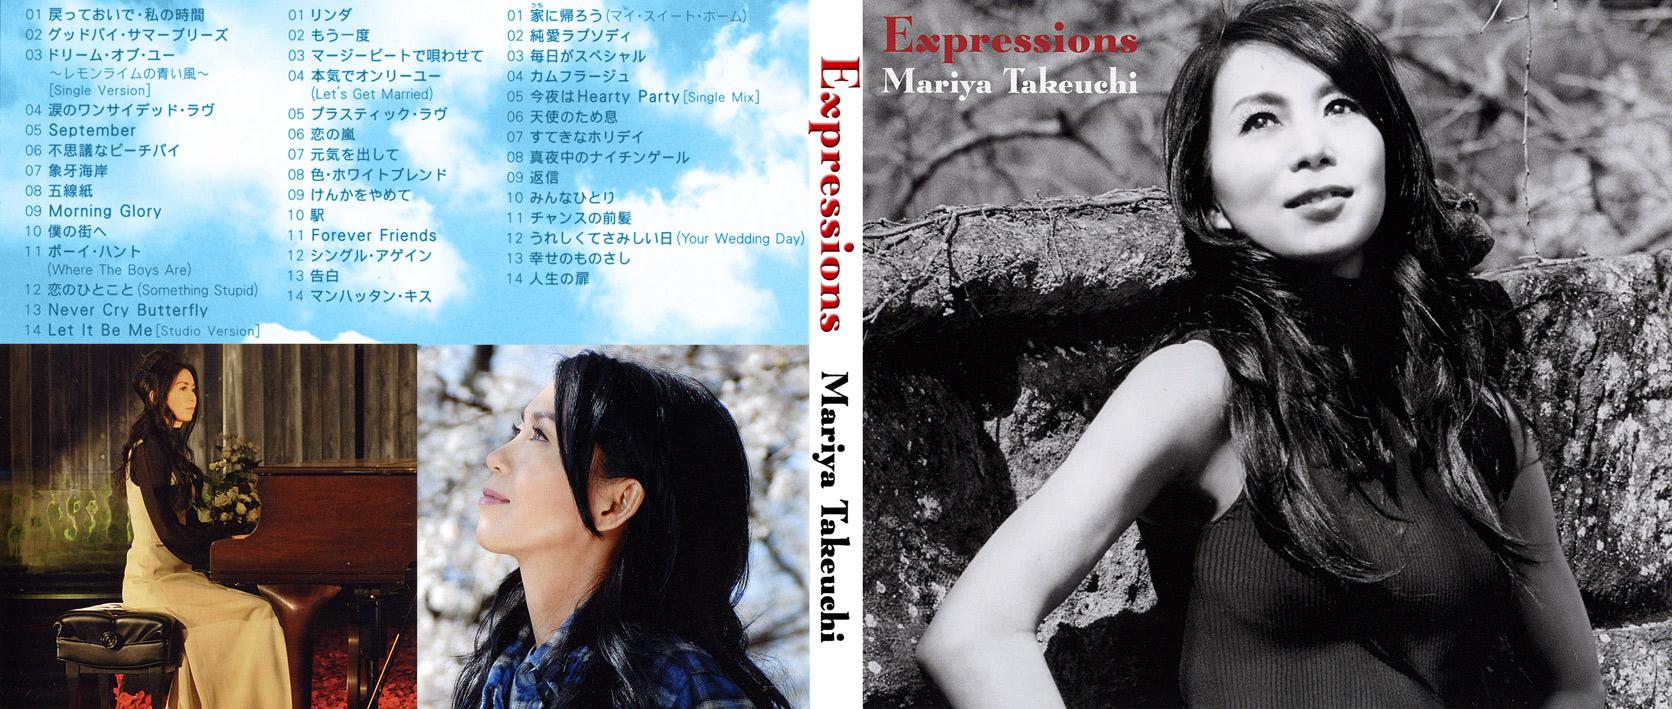 Mariya takeuchi 竹内 まりや plastic love - 4 6